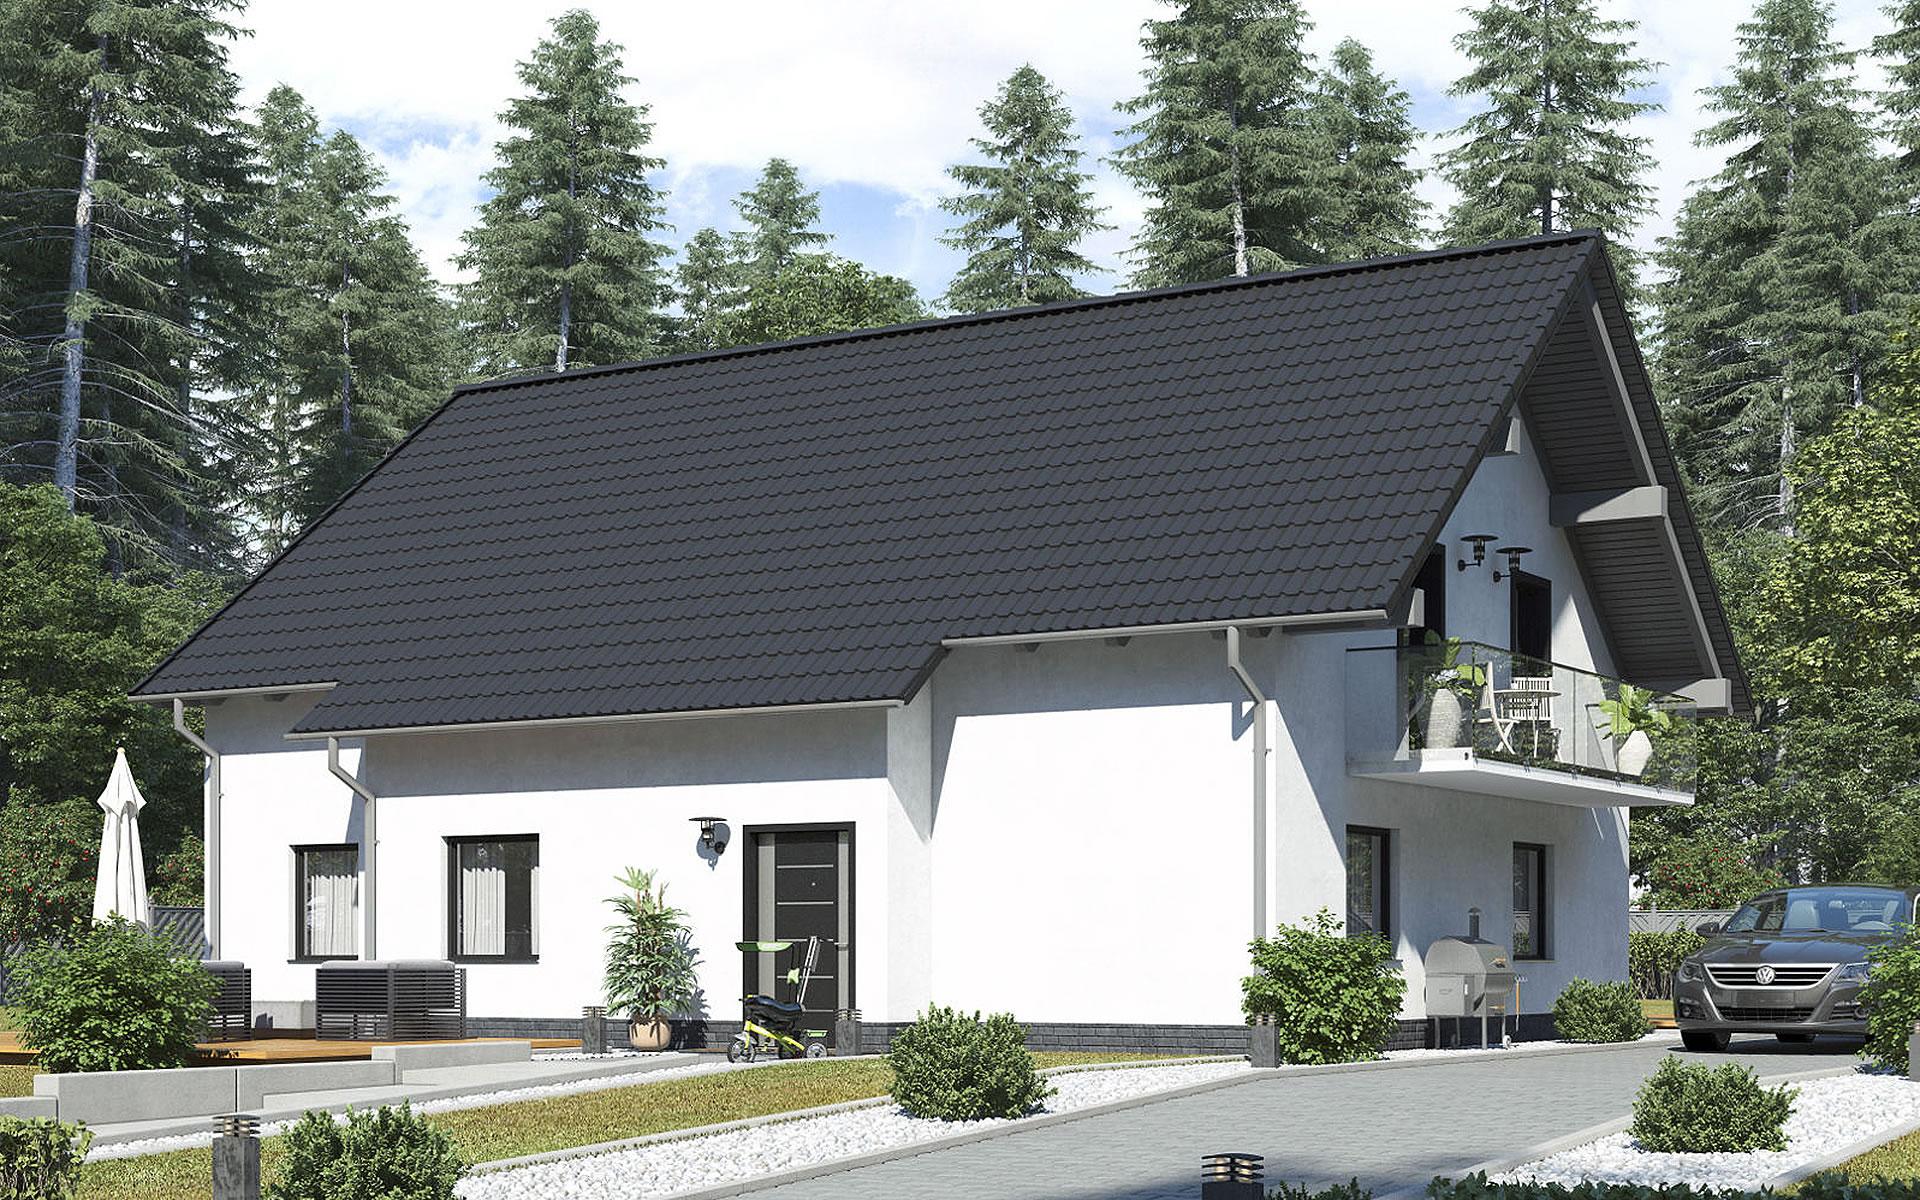 Zweifamilienhaus BS 181 - B&S Selbstbausysteme GmbH & Co. KG